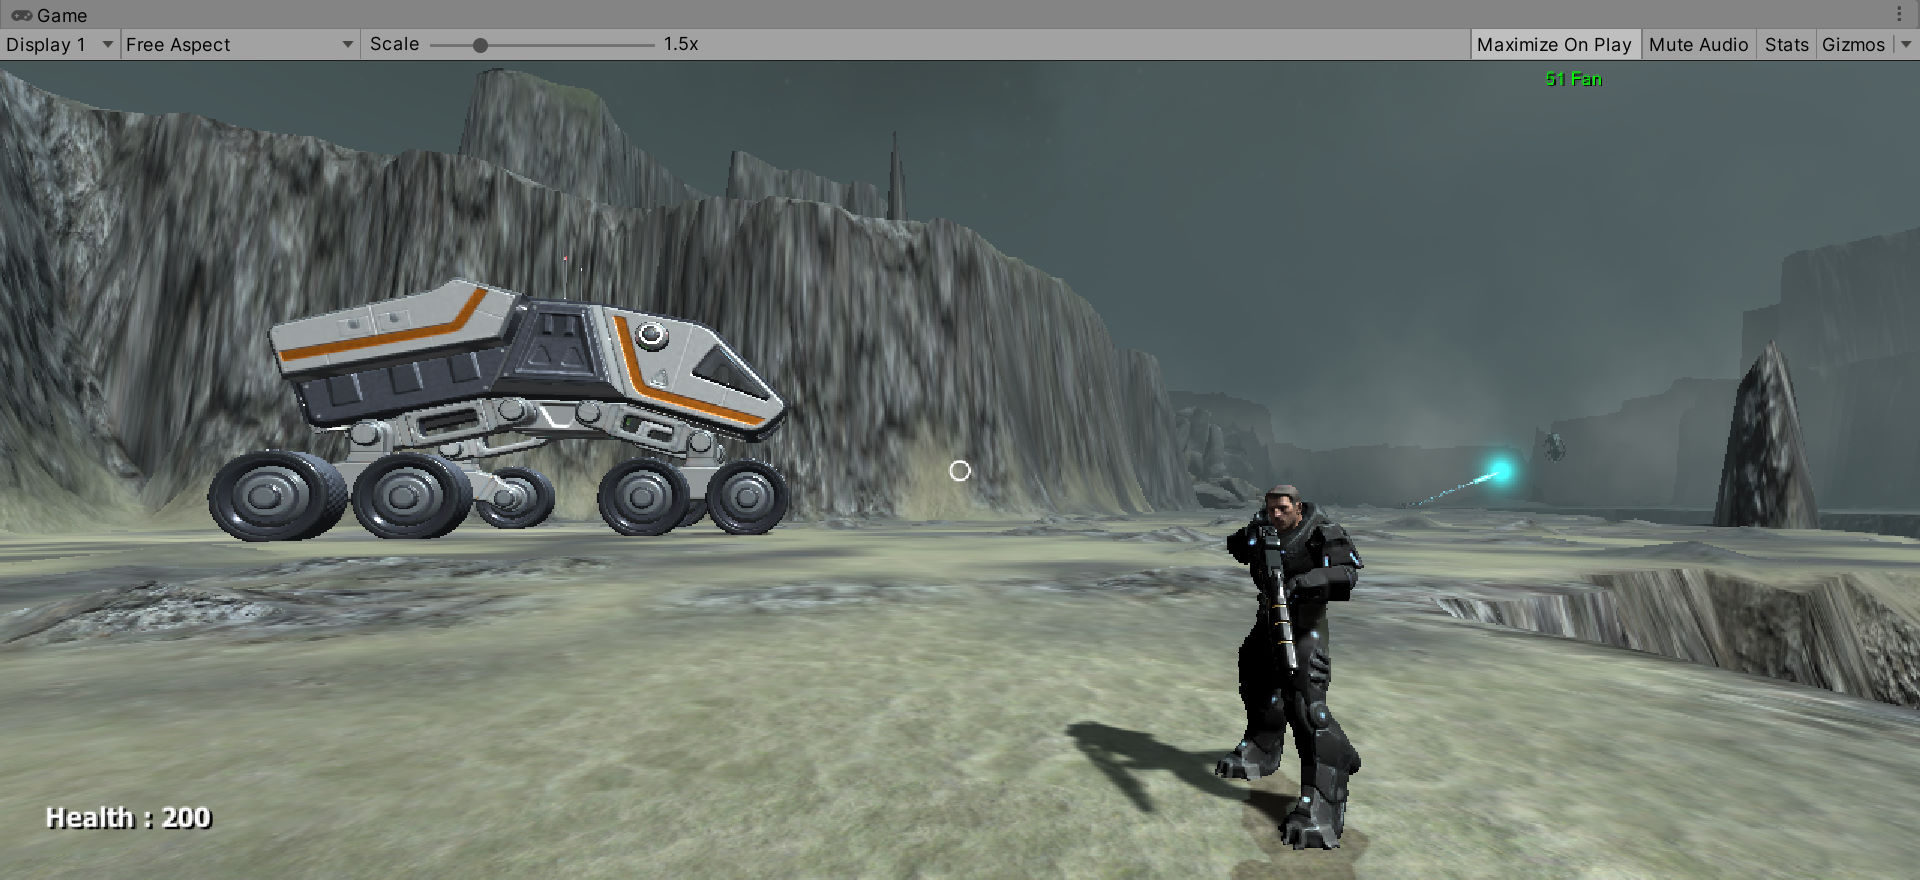 Unity 2020-08-06 09-39-00-914.jpg